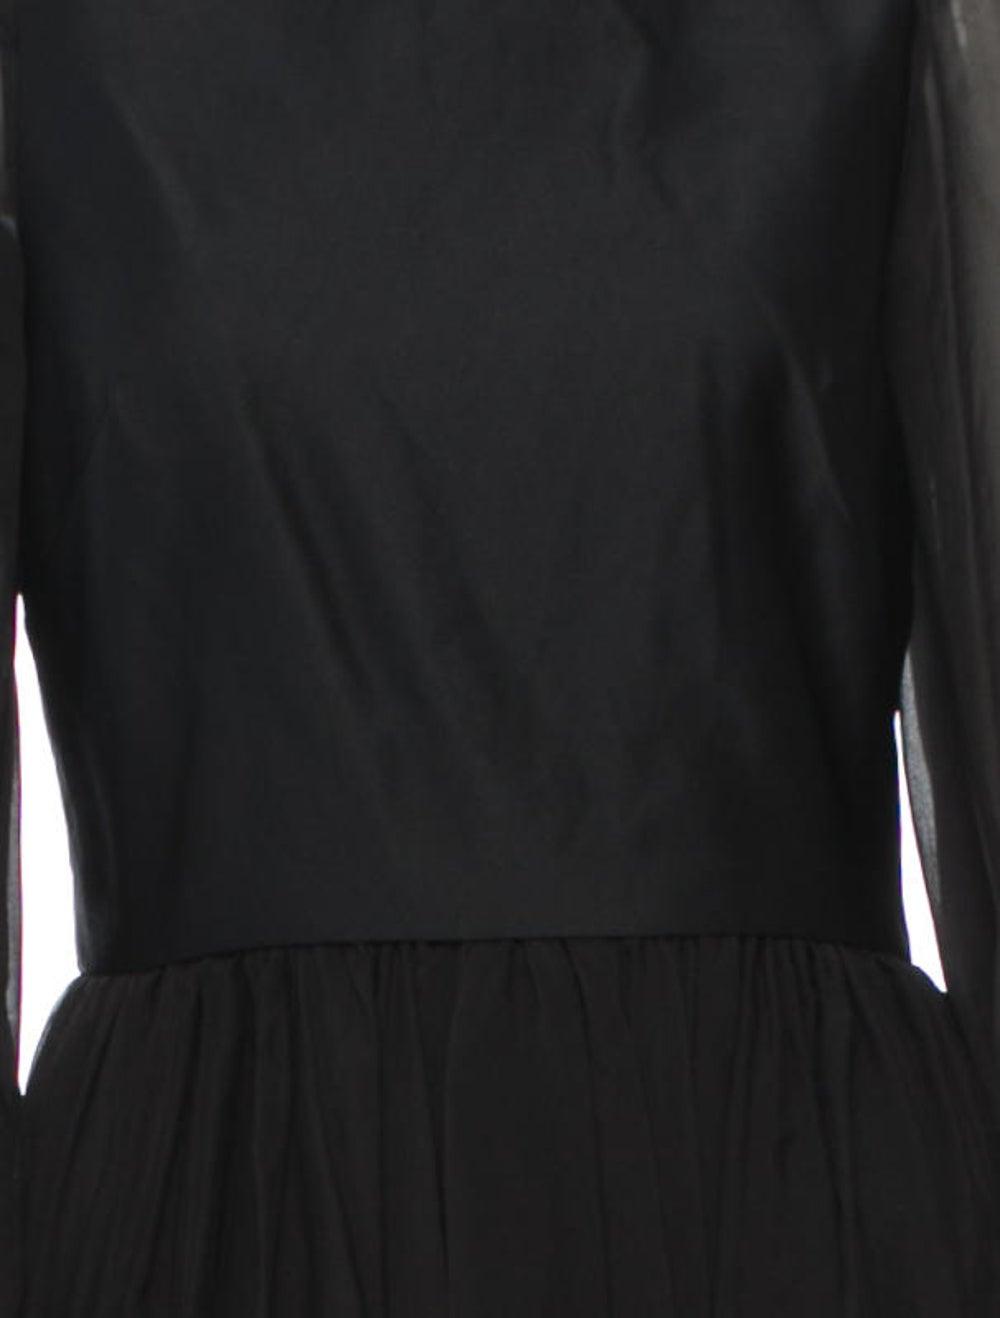 Plein Sud Silk Dress Black - image 4